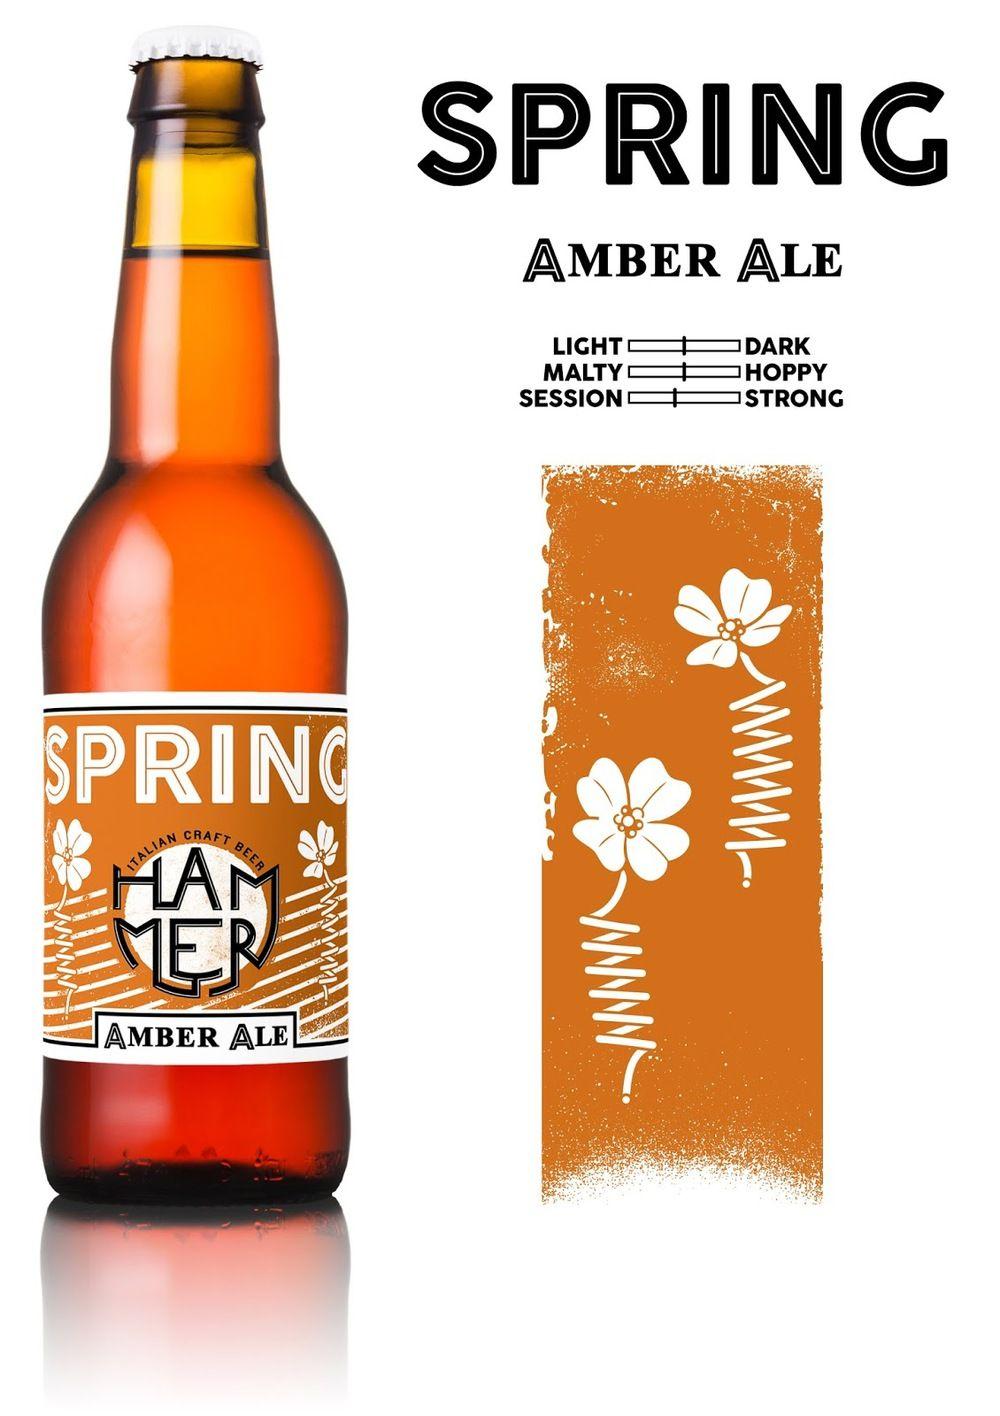 04_SPRING_amber-ale.jpg